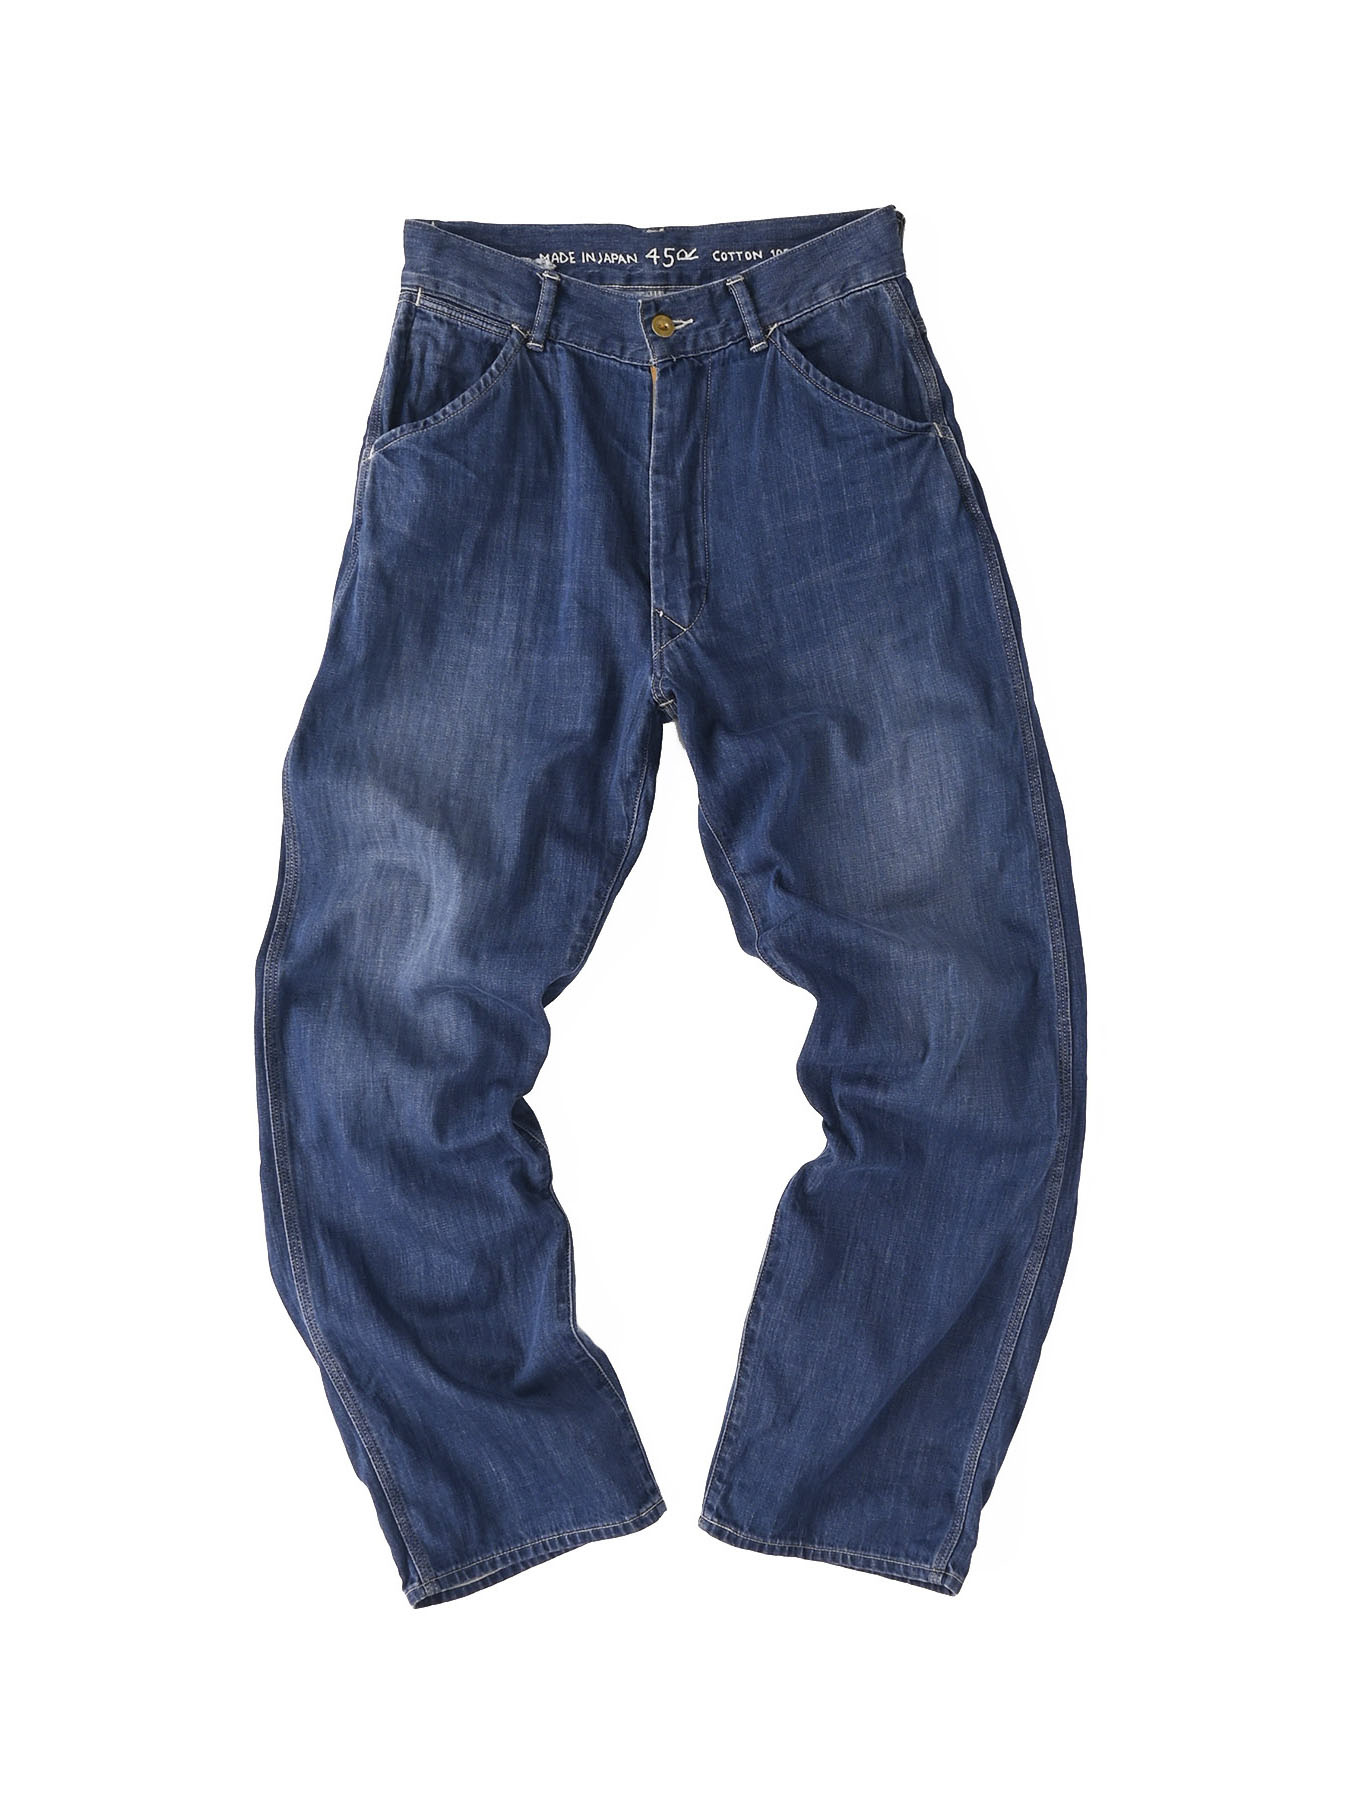 Indigo 908 Painter Pants Distressed (0721)-1